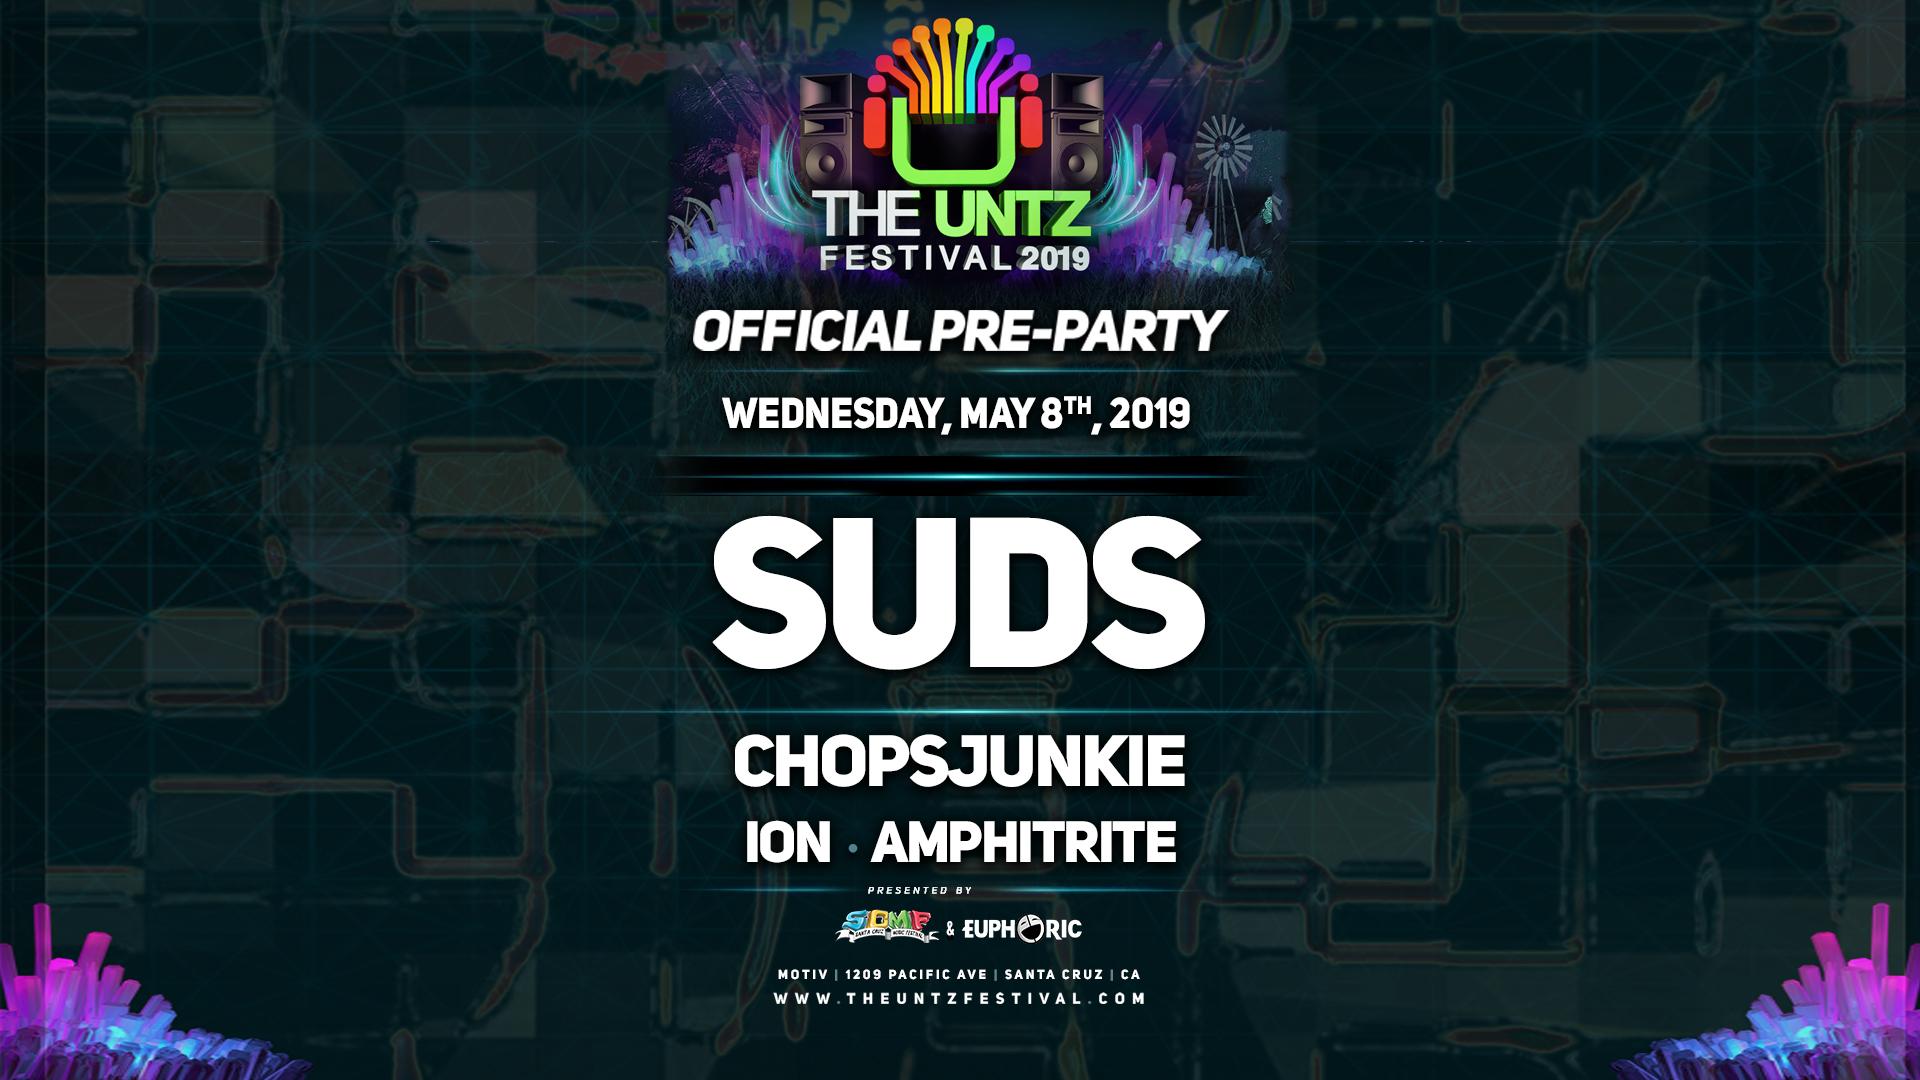 untz-pre-party_5-8-19_Motiv_Suds_banner